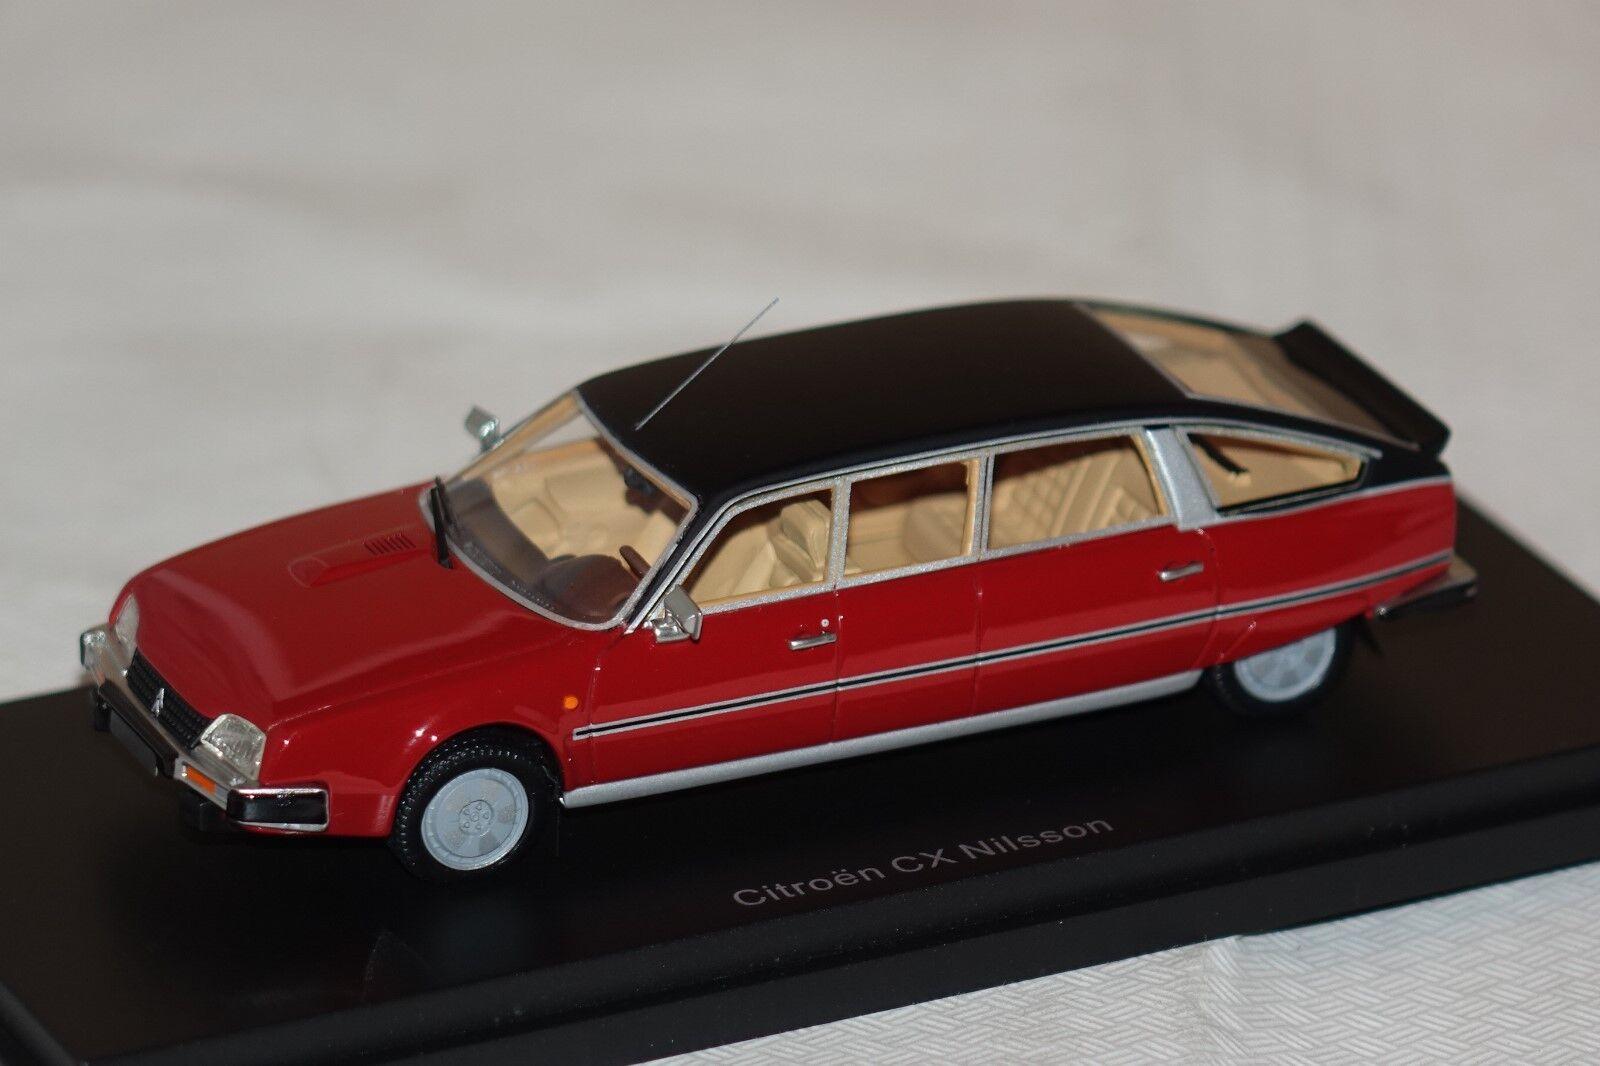 Citroen CX Nilsson rot-schwarz 1 43 BoS 43336 neu & OVP